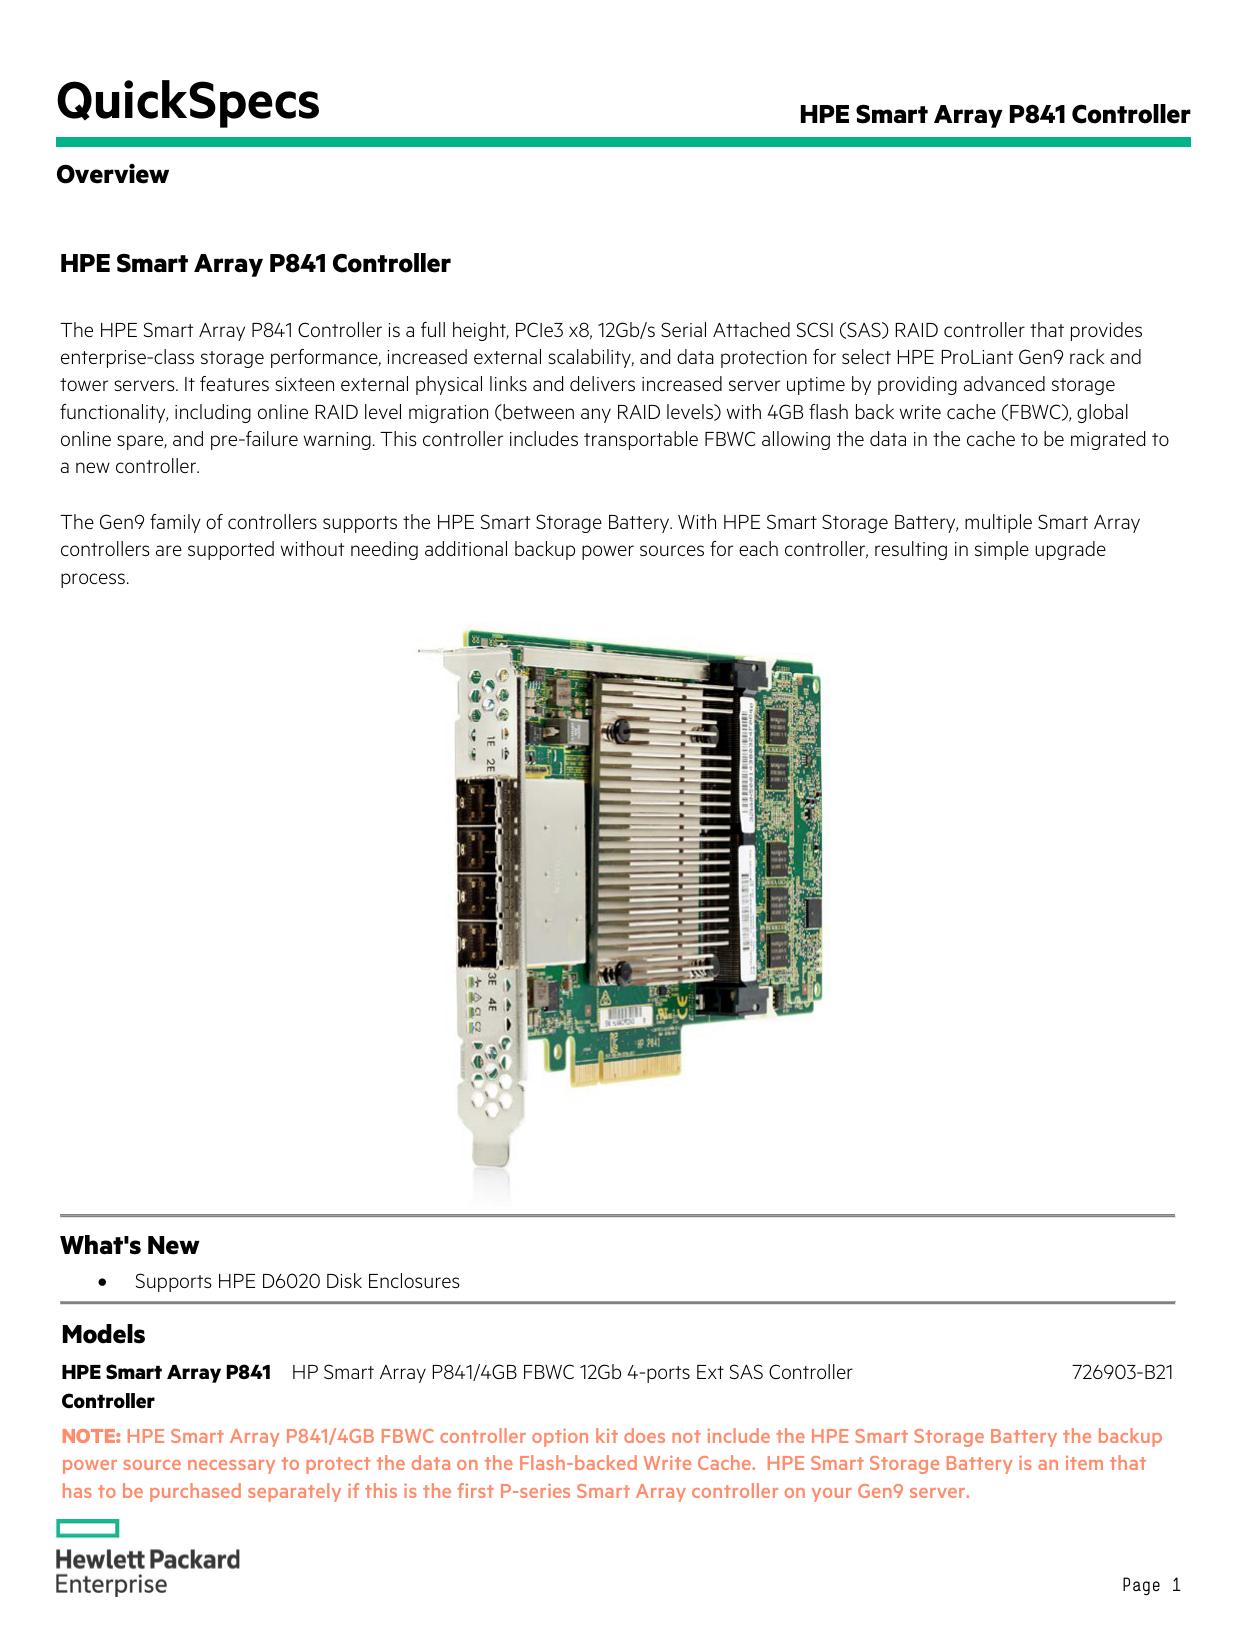 Hpe Smart Array P841 Controller Sas Sata With Encryption